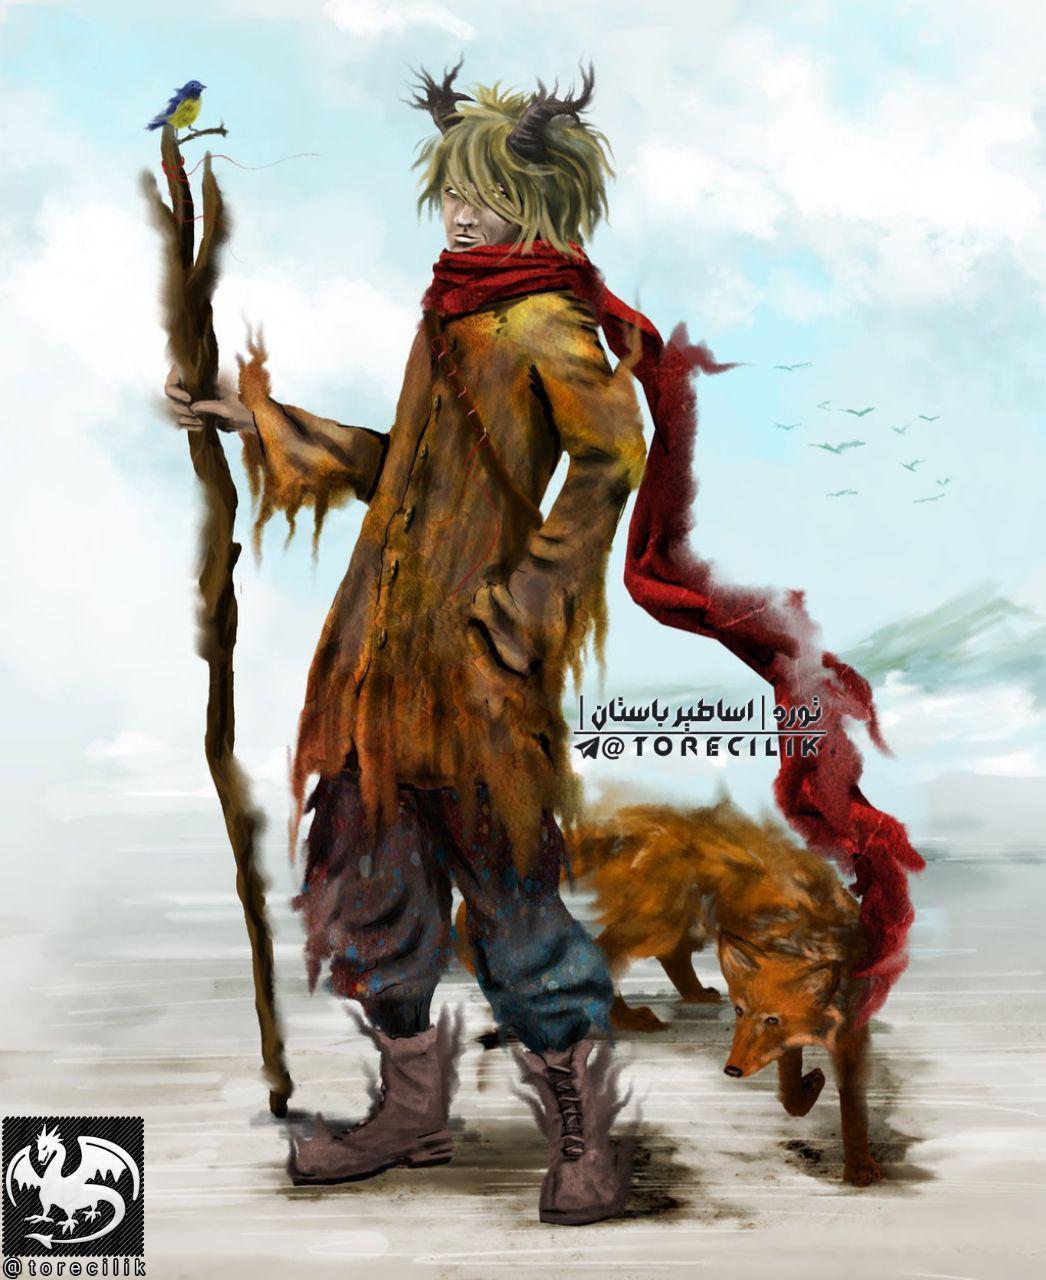 آرچورا: روح جنگل